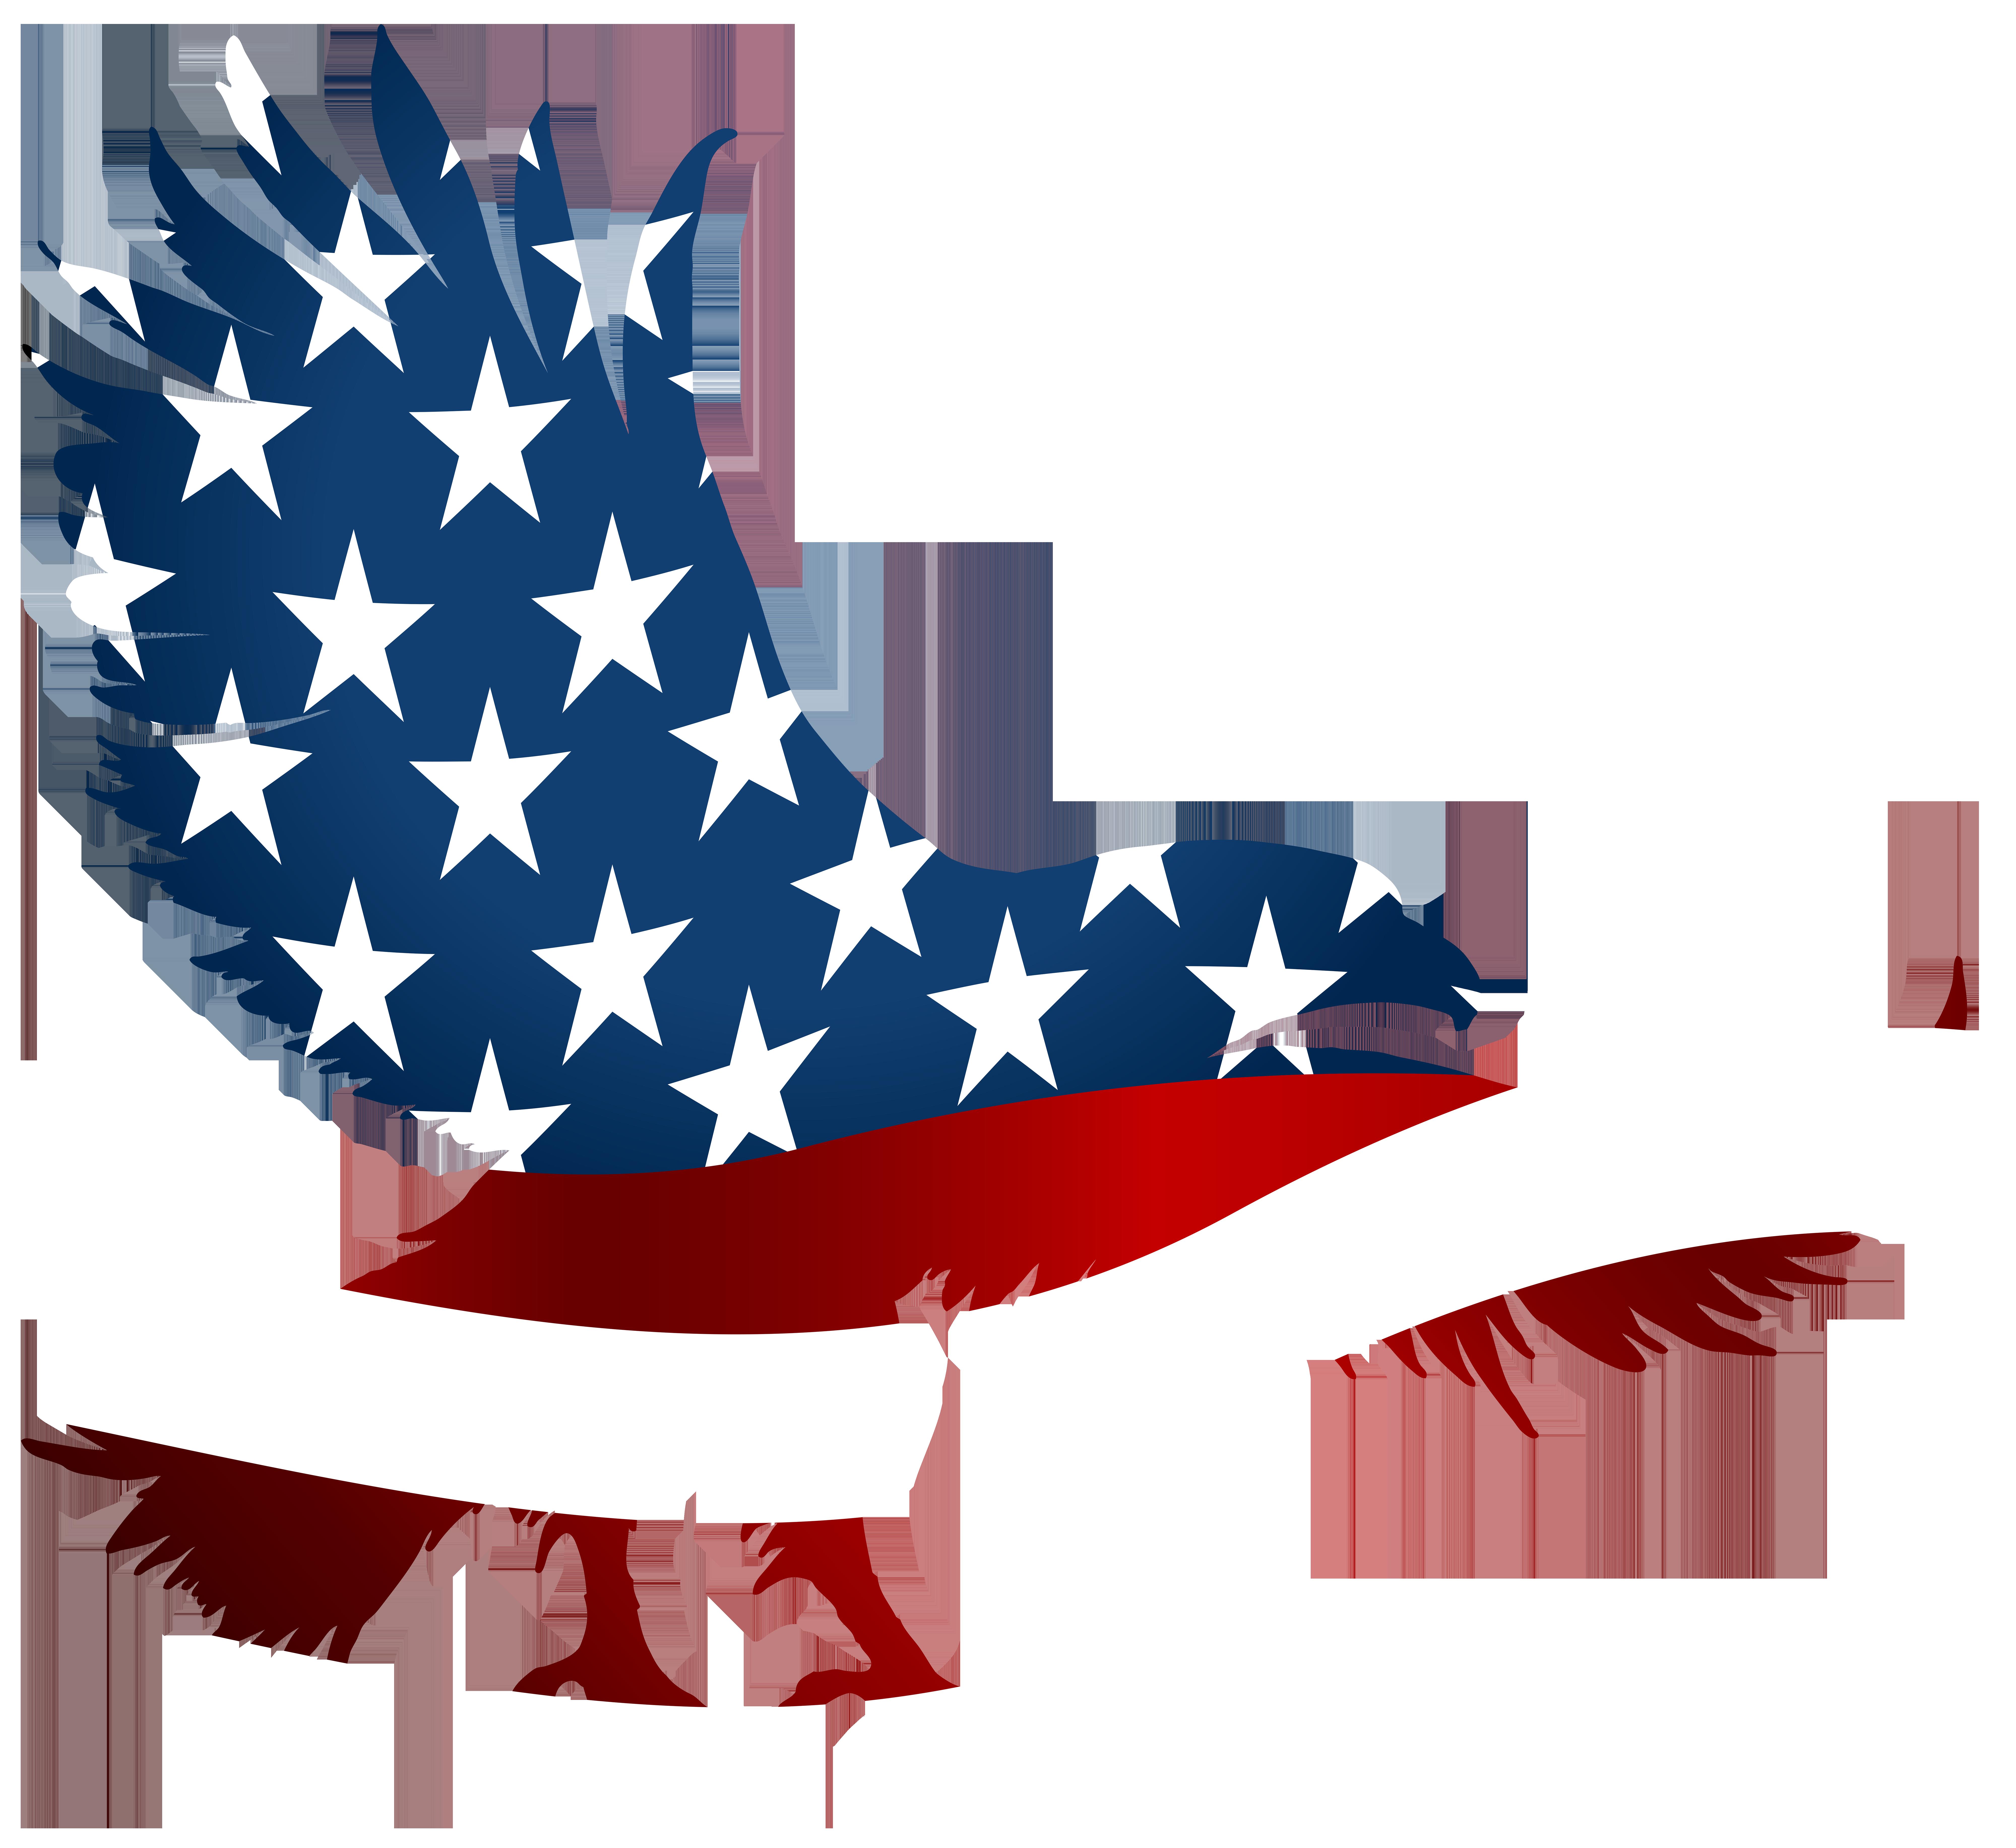 American eagle flag.